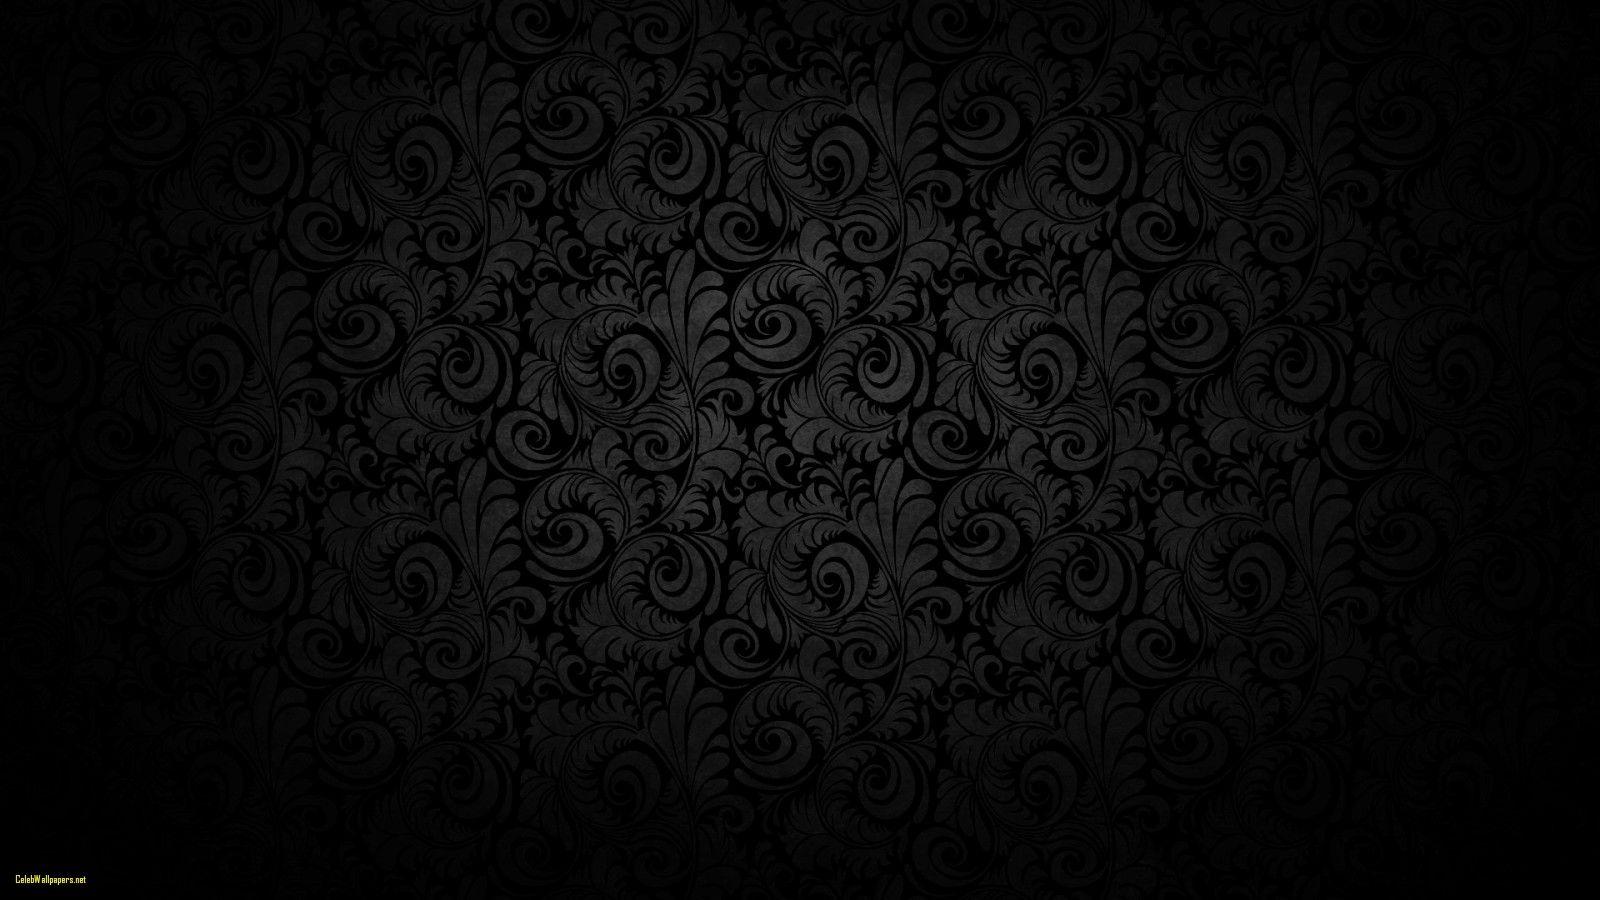 Wallpaper Hd 1600x900 Posted By Zoey Walker